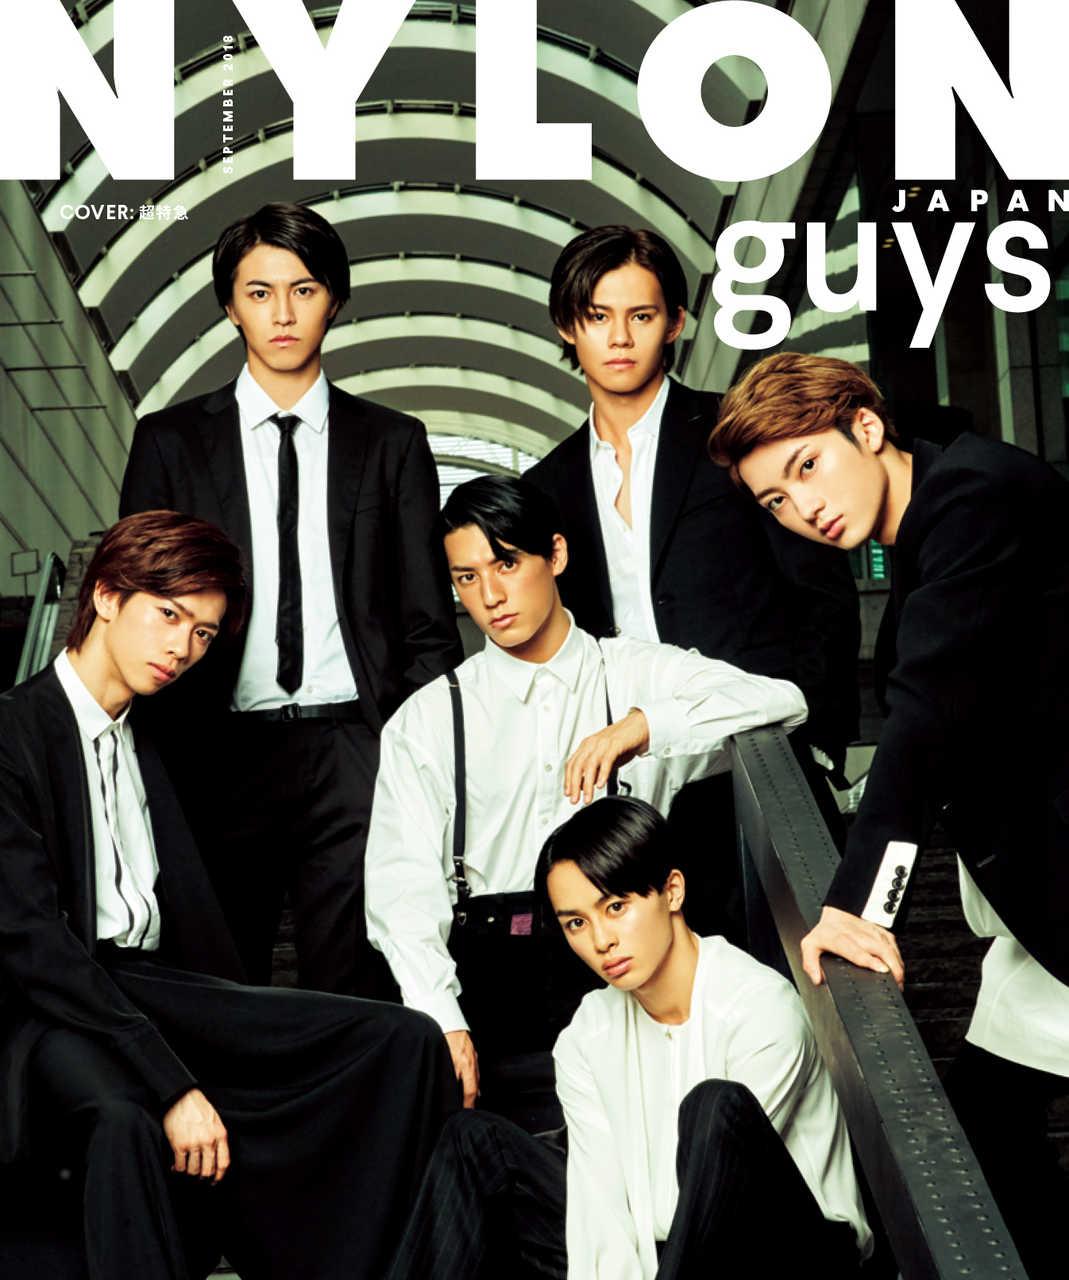 『NYLON guys JAPAN』7月28日発売号